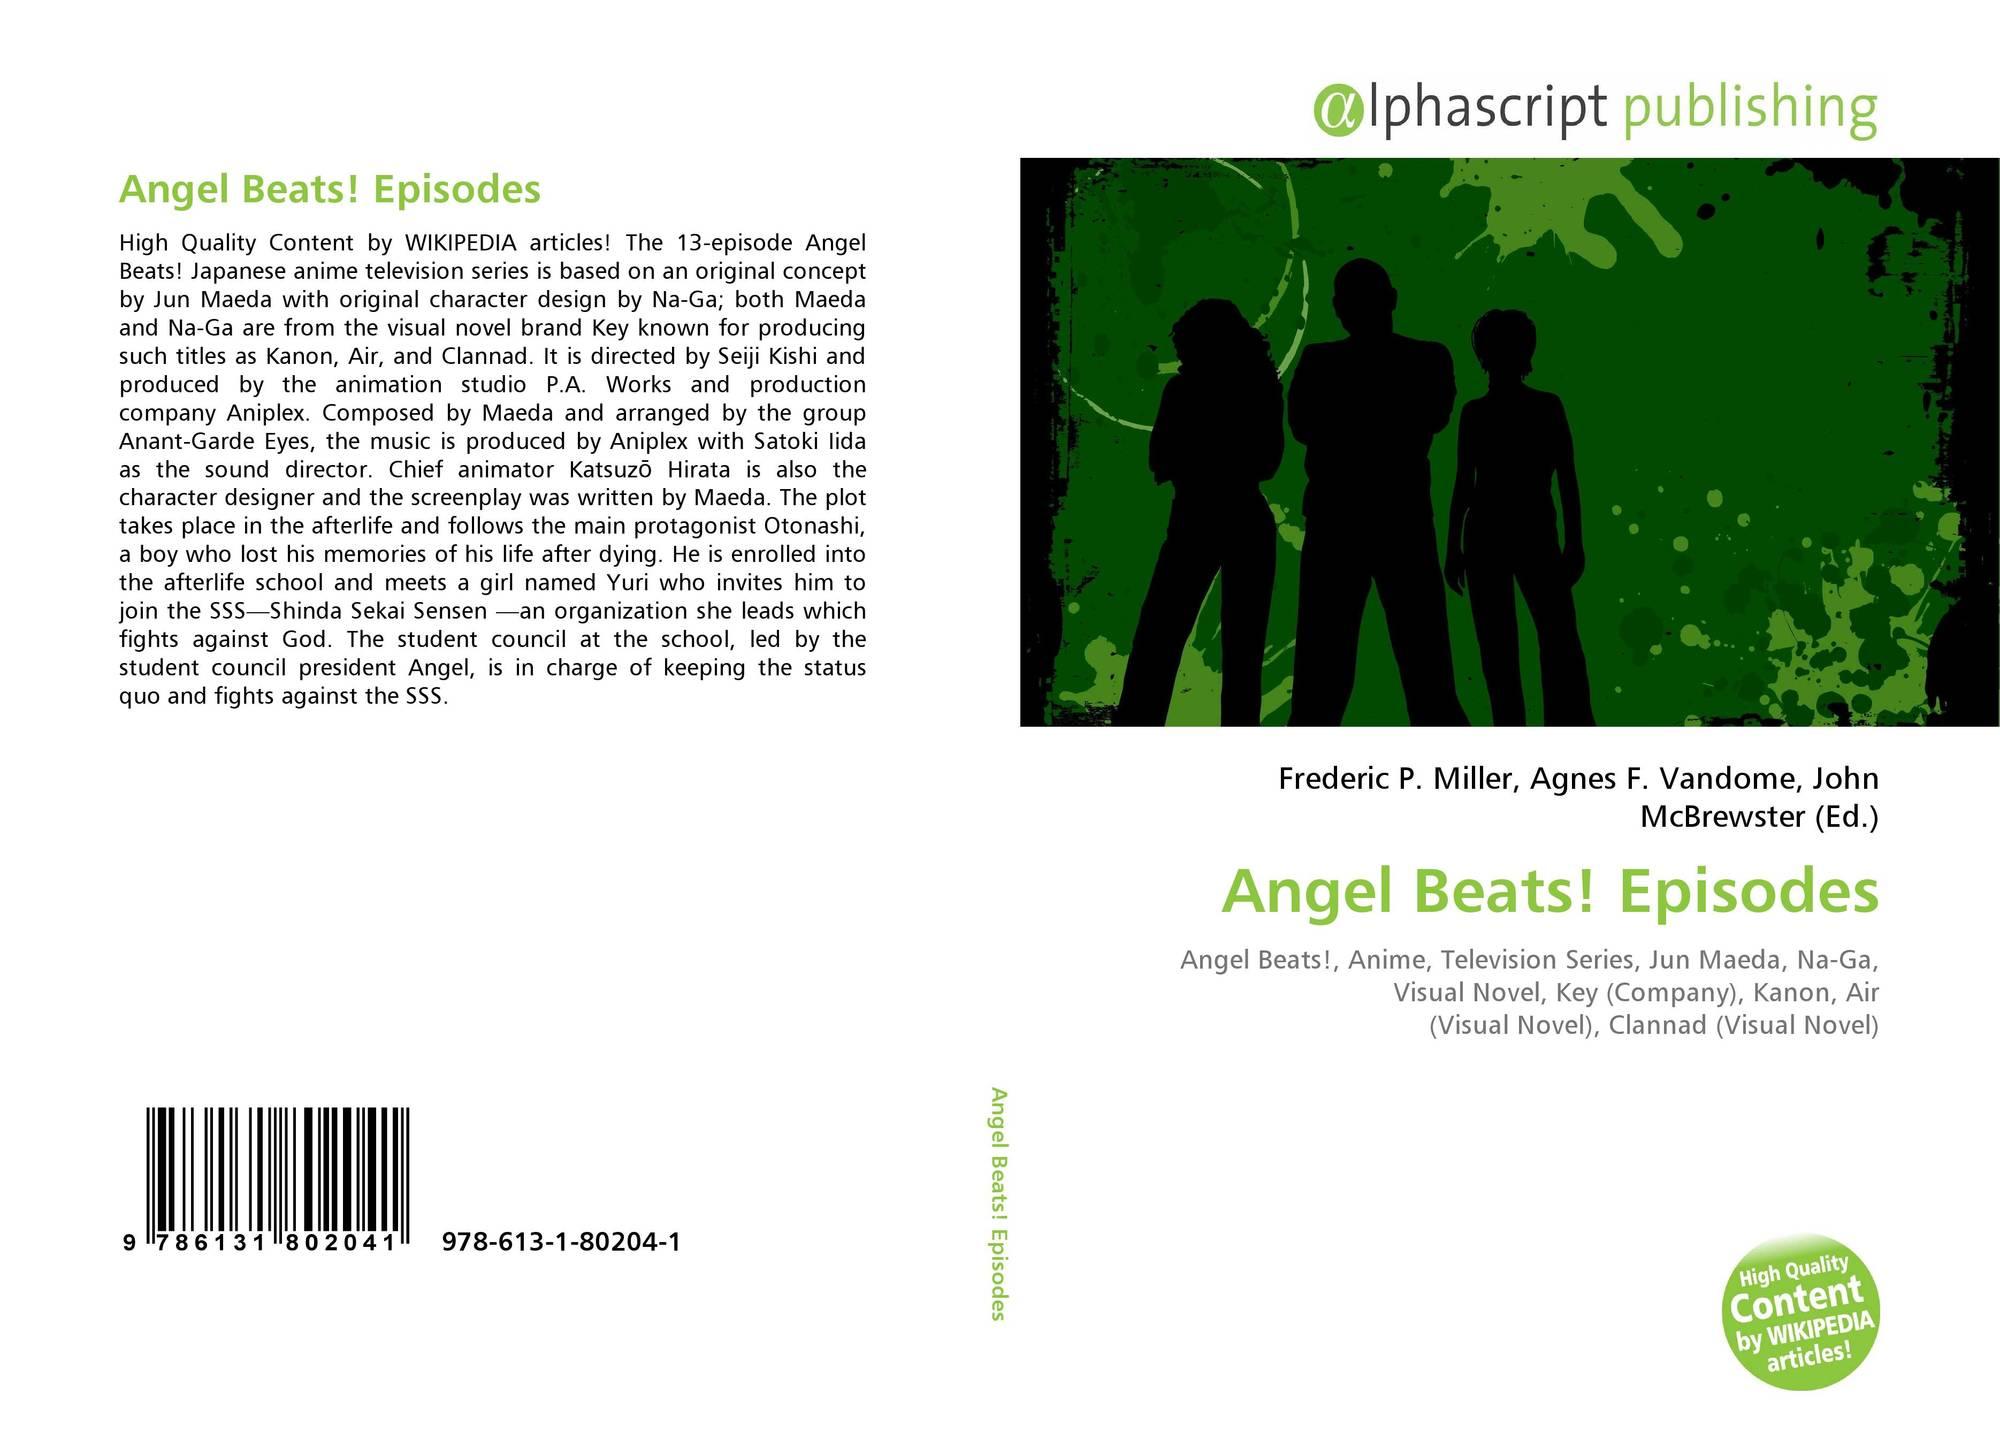 Angel Beats! Episodes, 978-613-1-80204-1, 6131802041